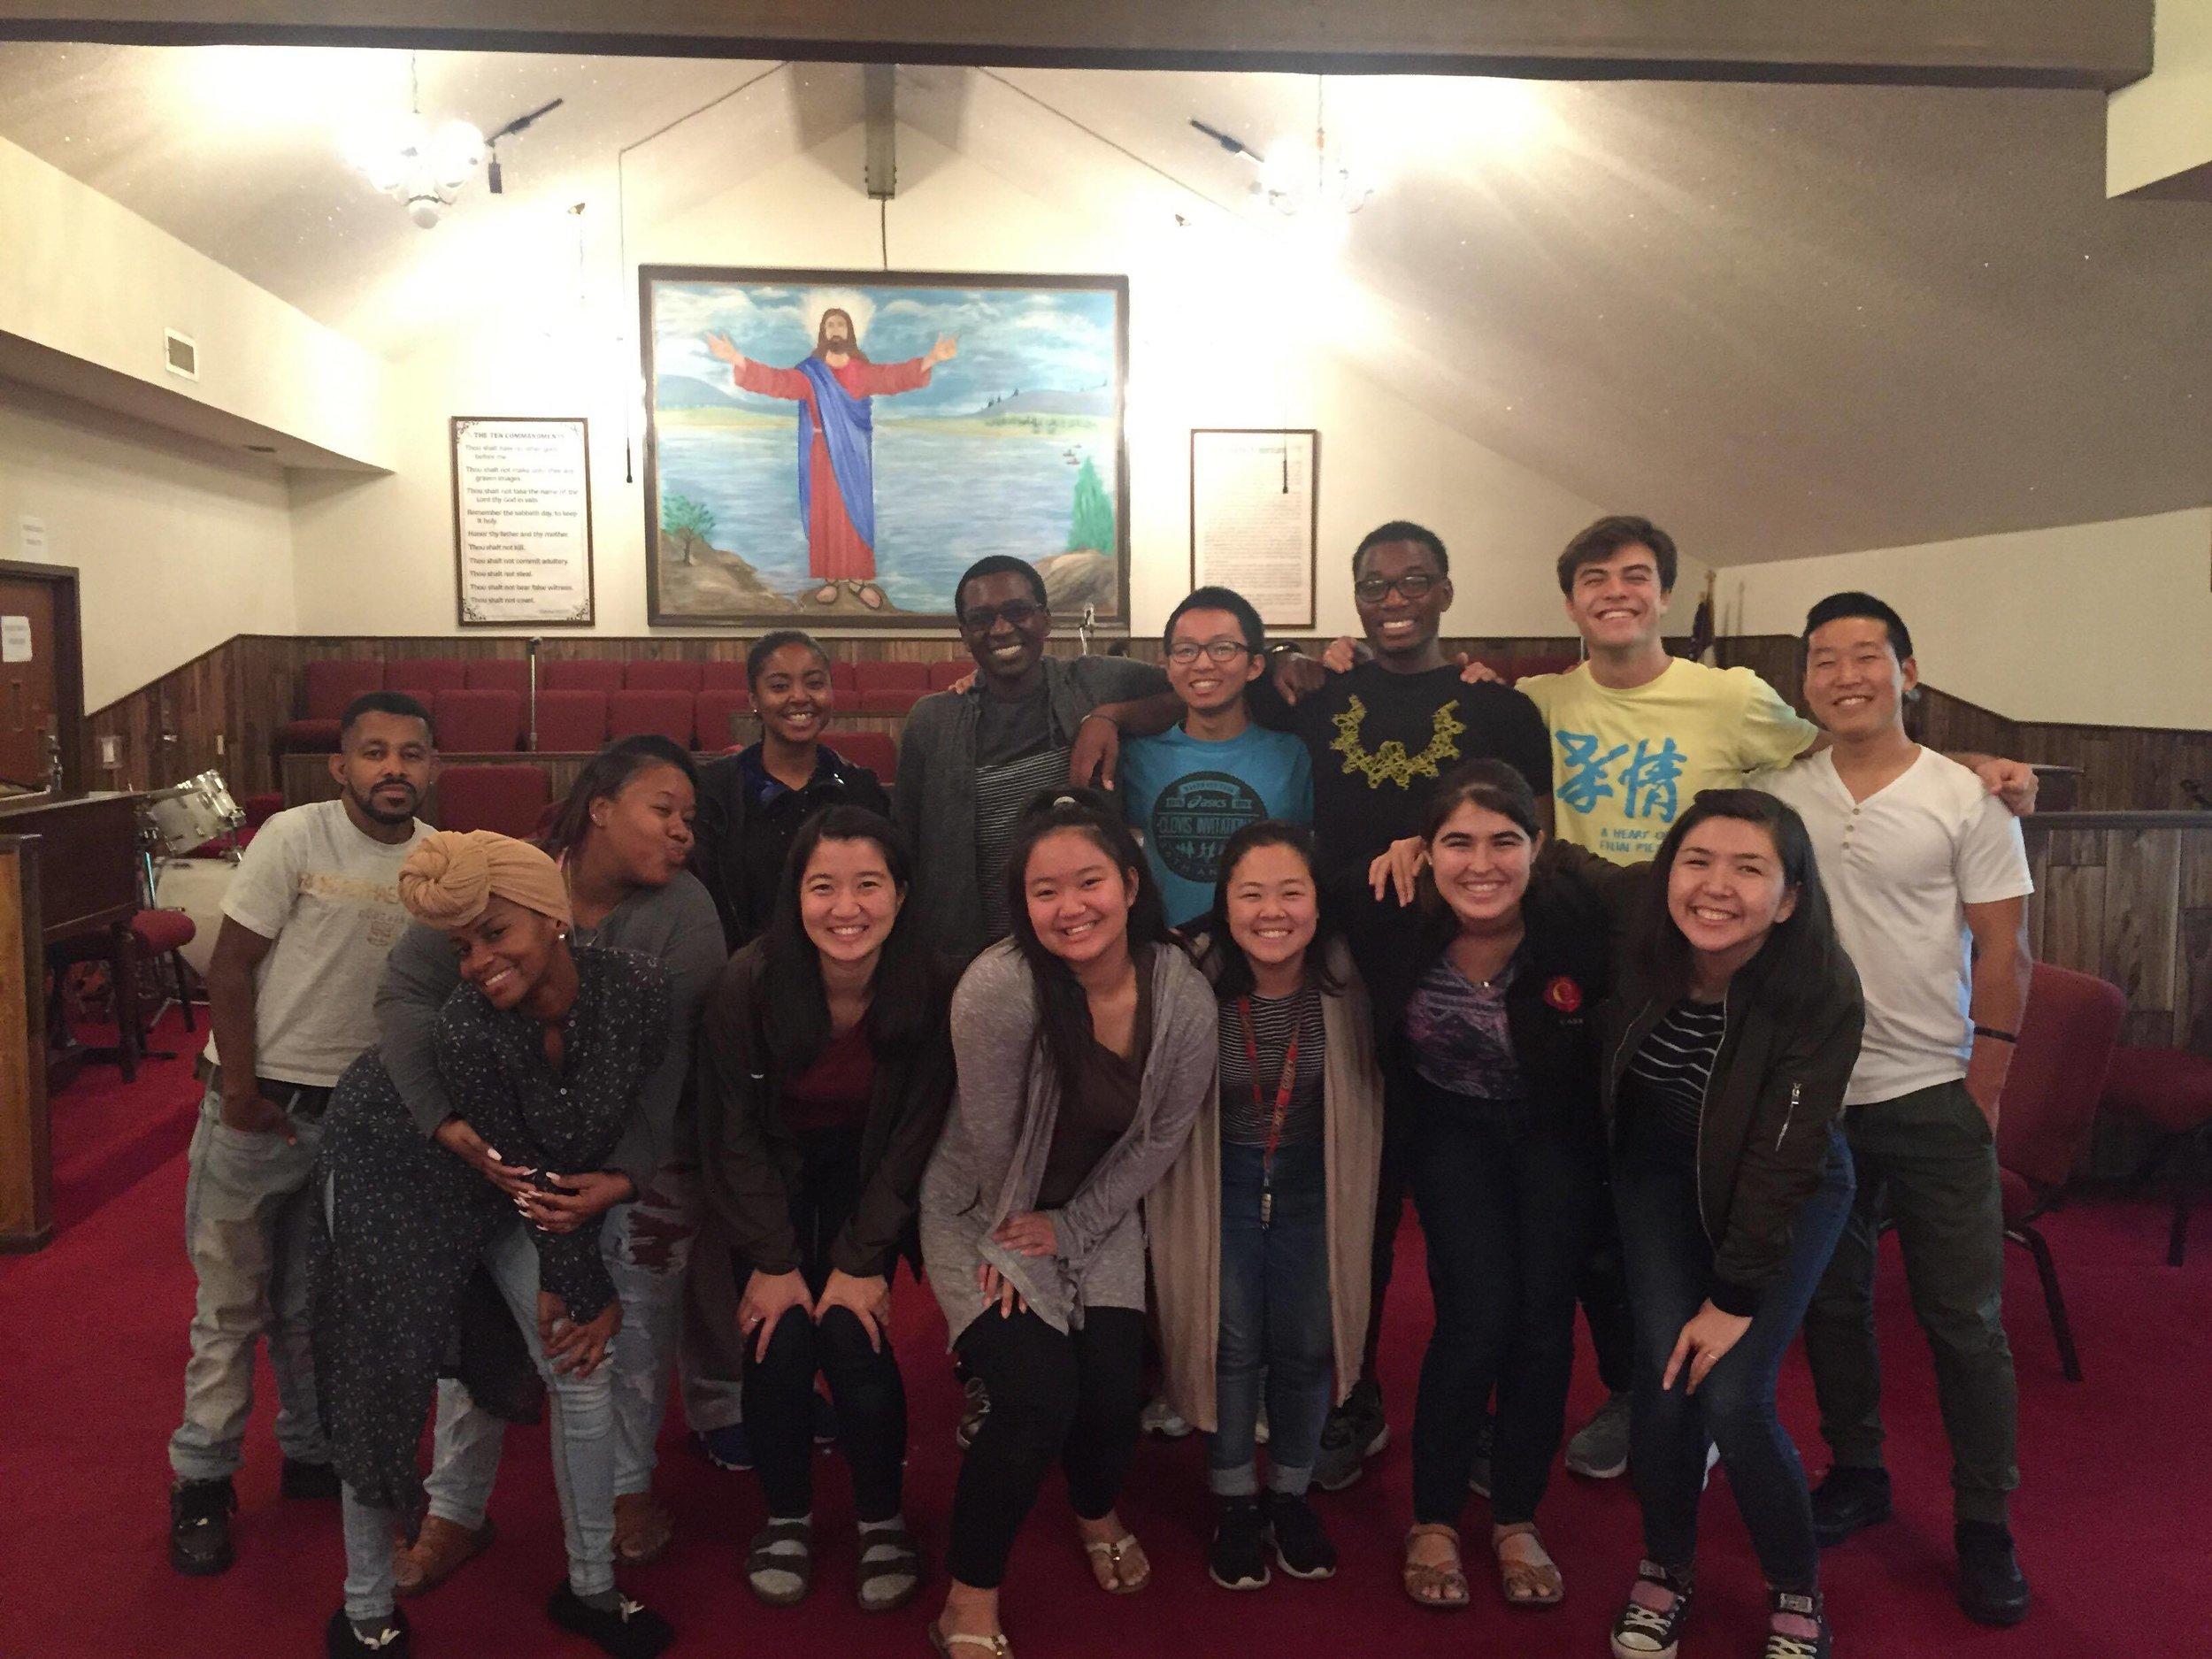 CARP LA visits Rock of Faith Church for Bible Study!